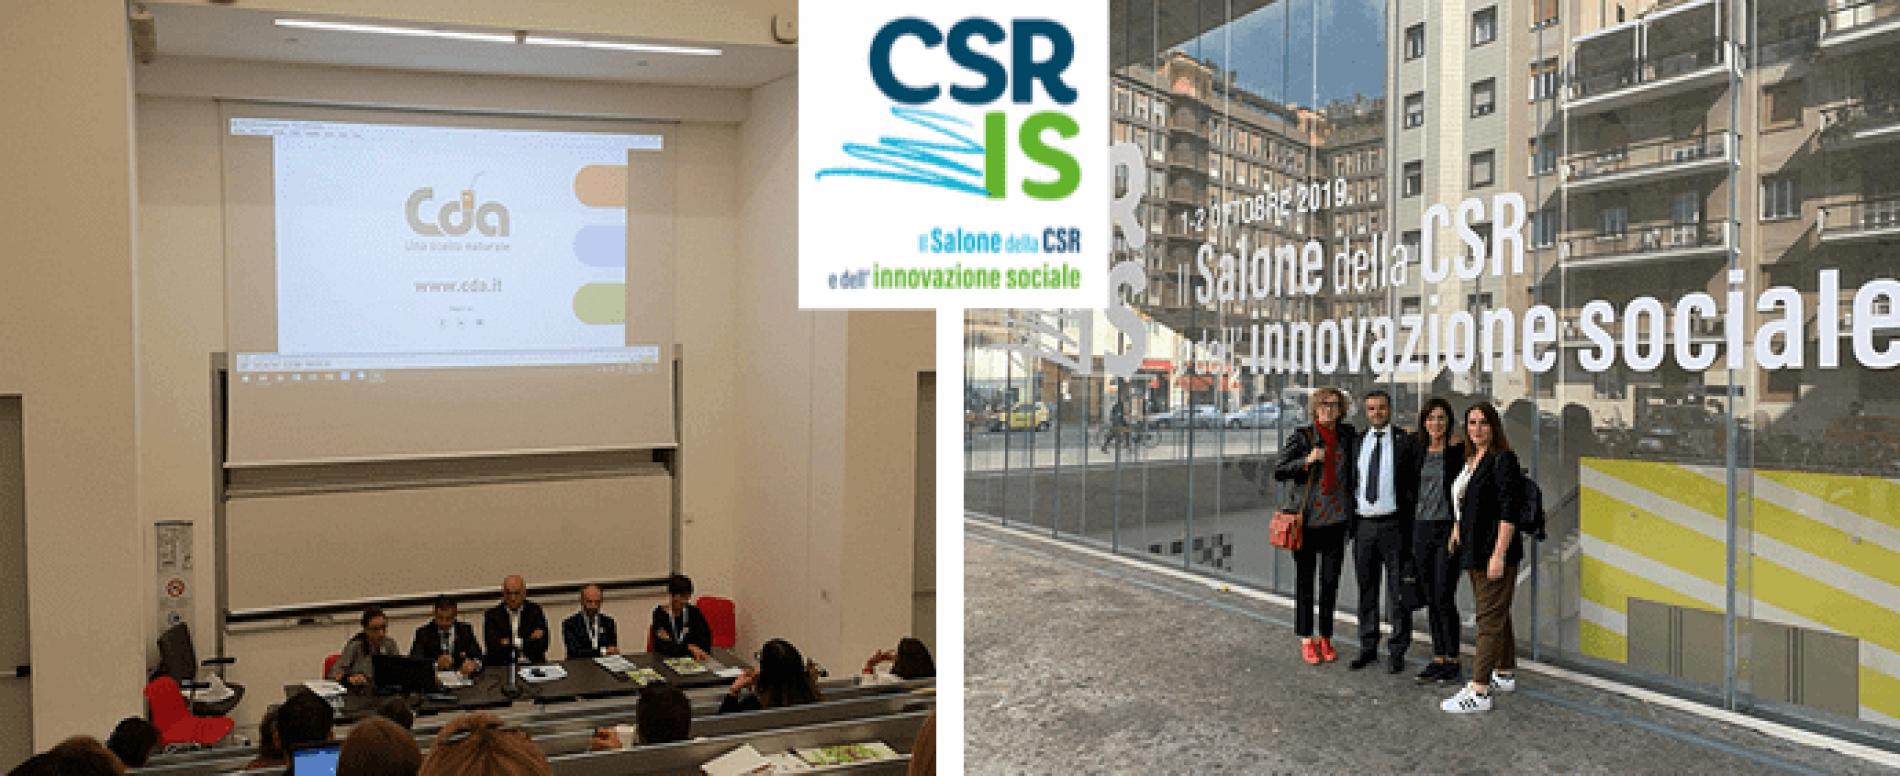 CDA Cattelan Distributori Automatici a Milano al Salone CSR